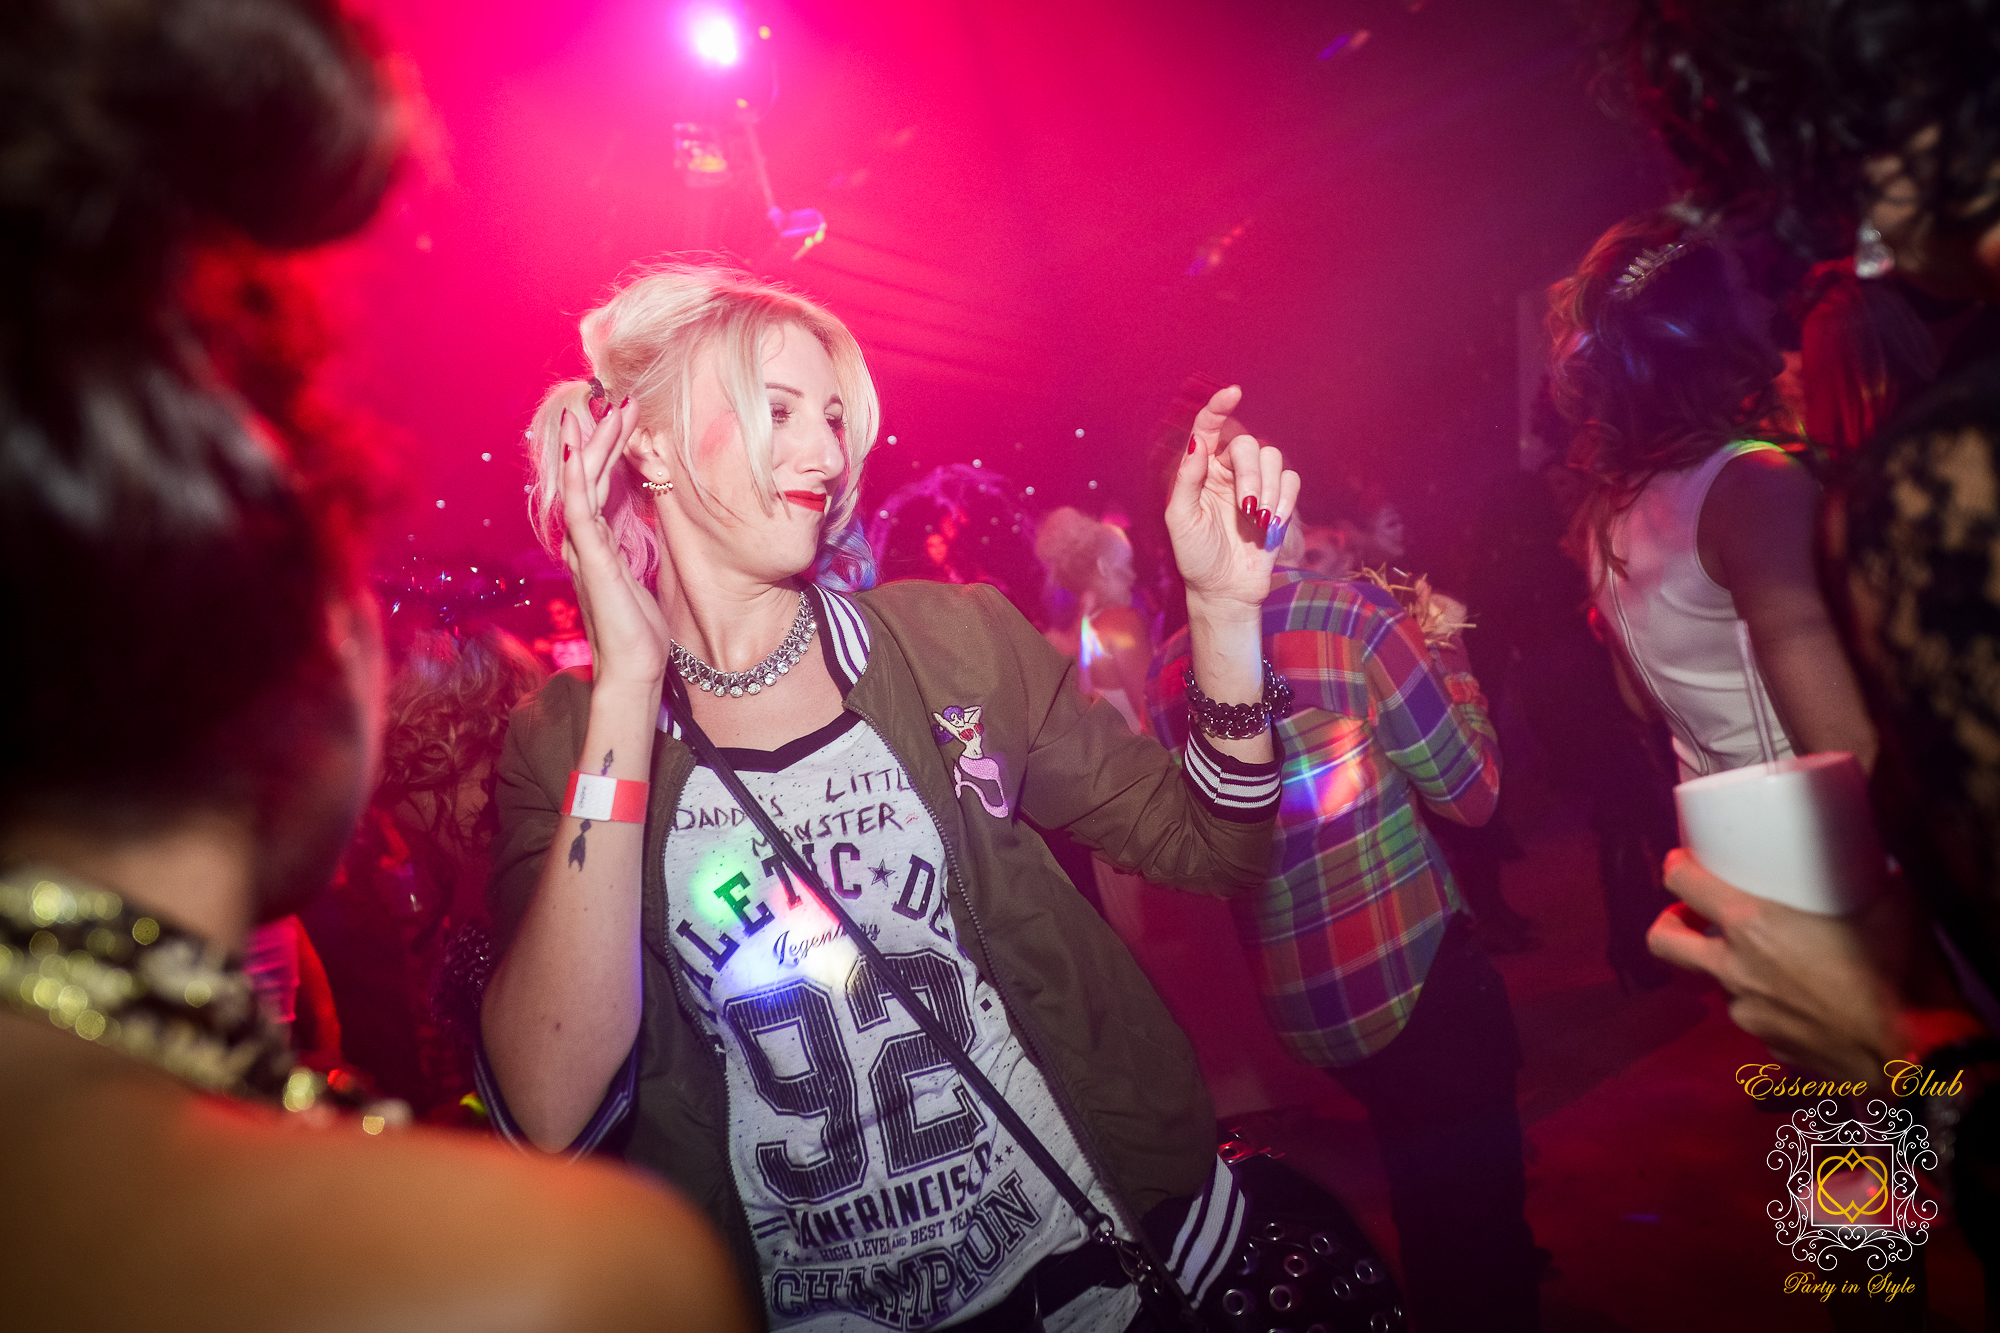 Essence club dance night